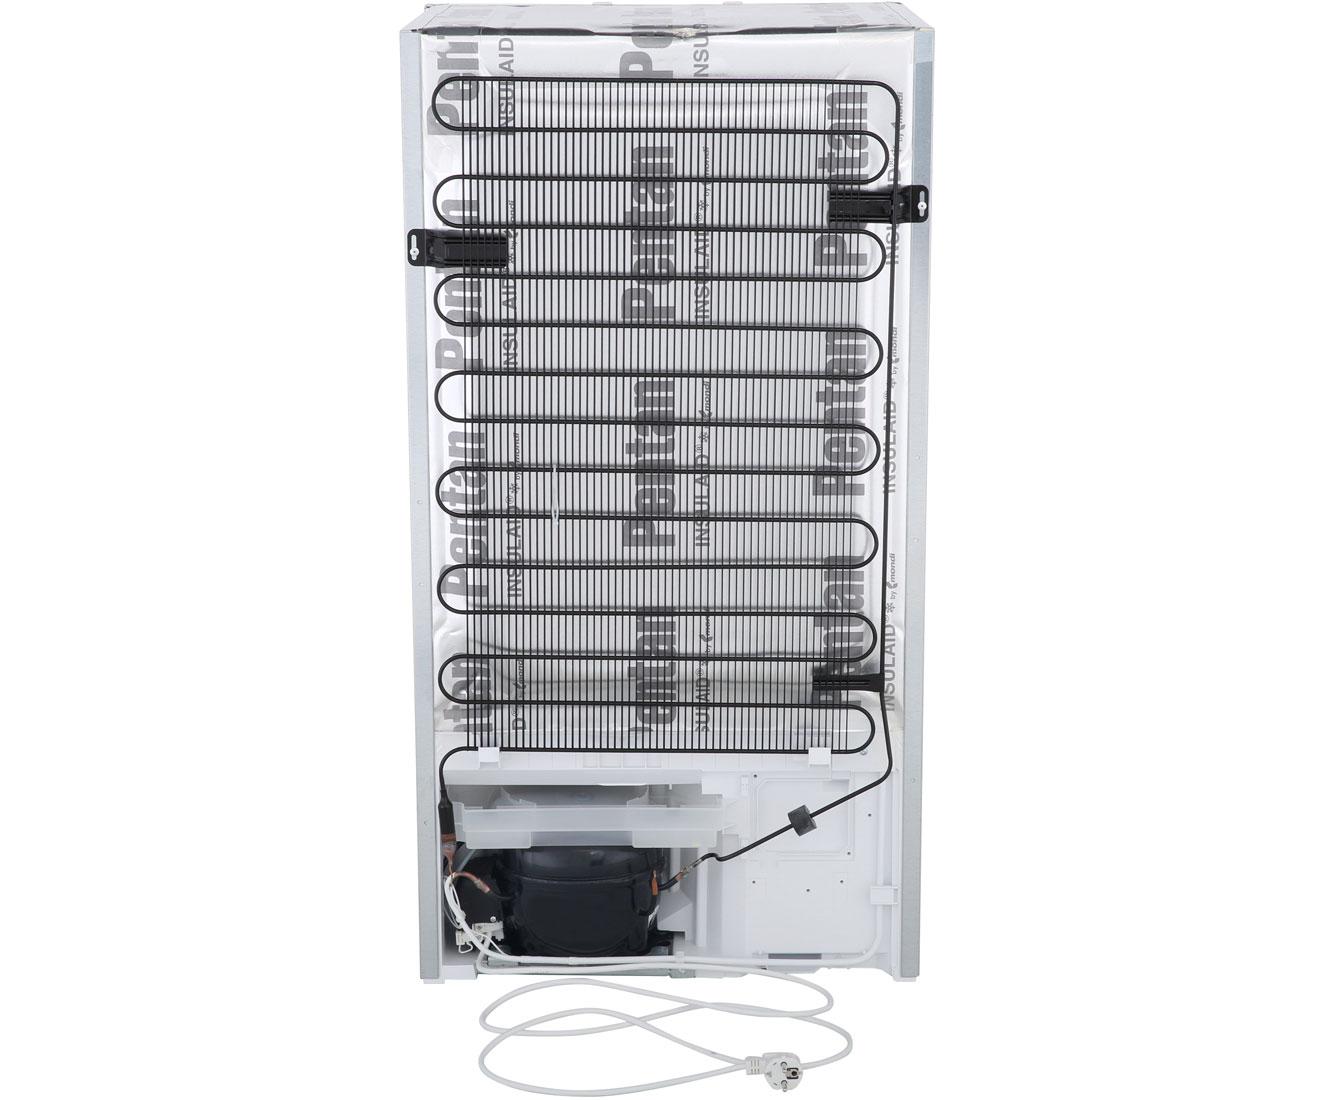 Bosch Kühlschrank Lautes Knacken : Bosch kühlschrank kompressor brummt bosch kühlschrank kompressor